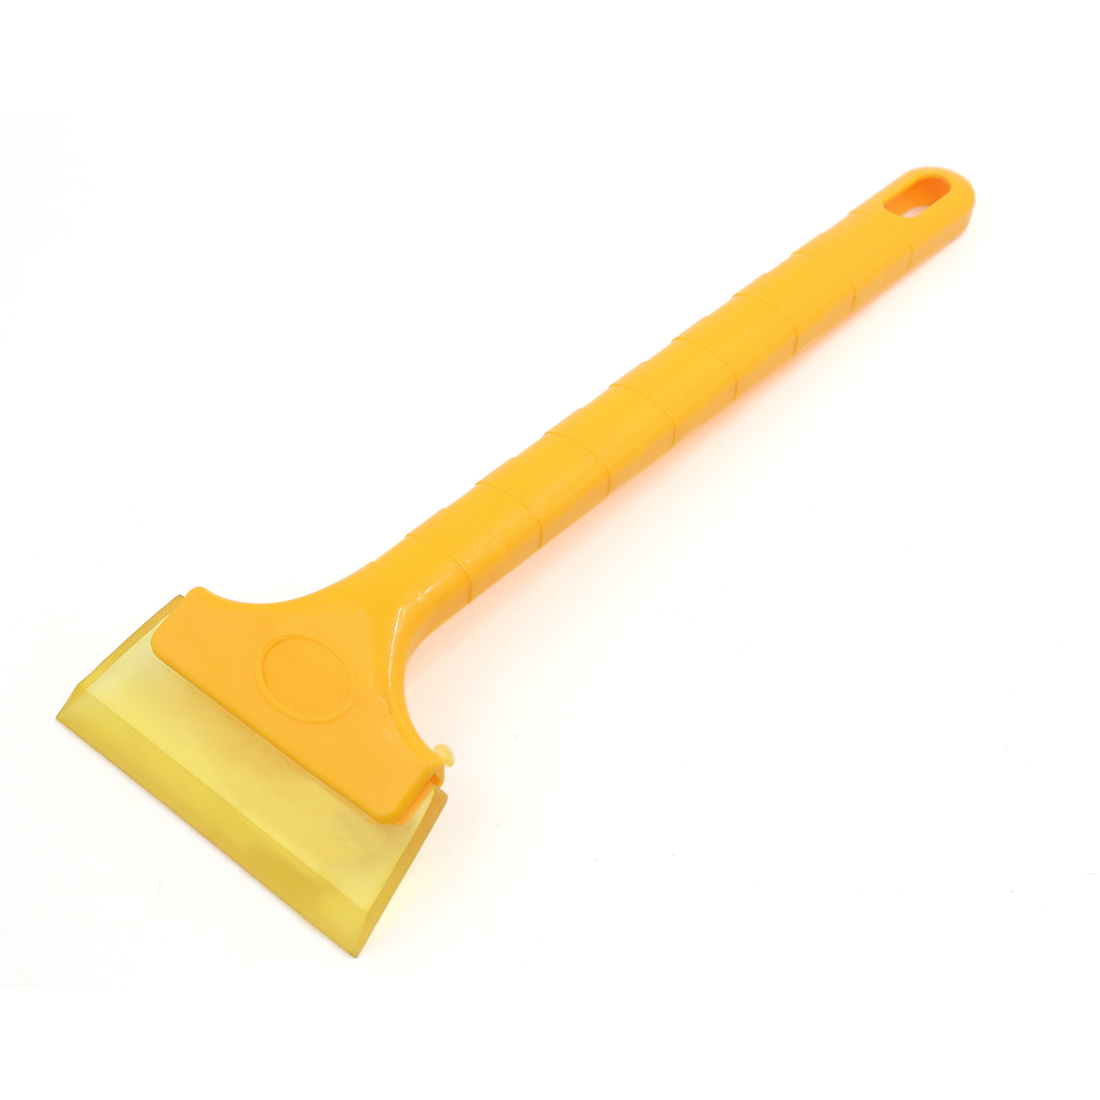 UXCELL 13″ Long Antislip Handle Car Window Film Bubble Cleaner Ice Scraper Orange